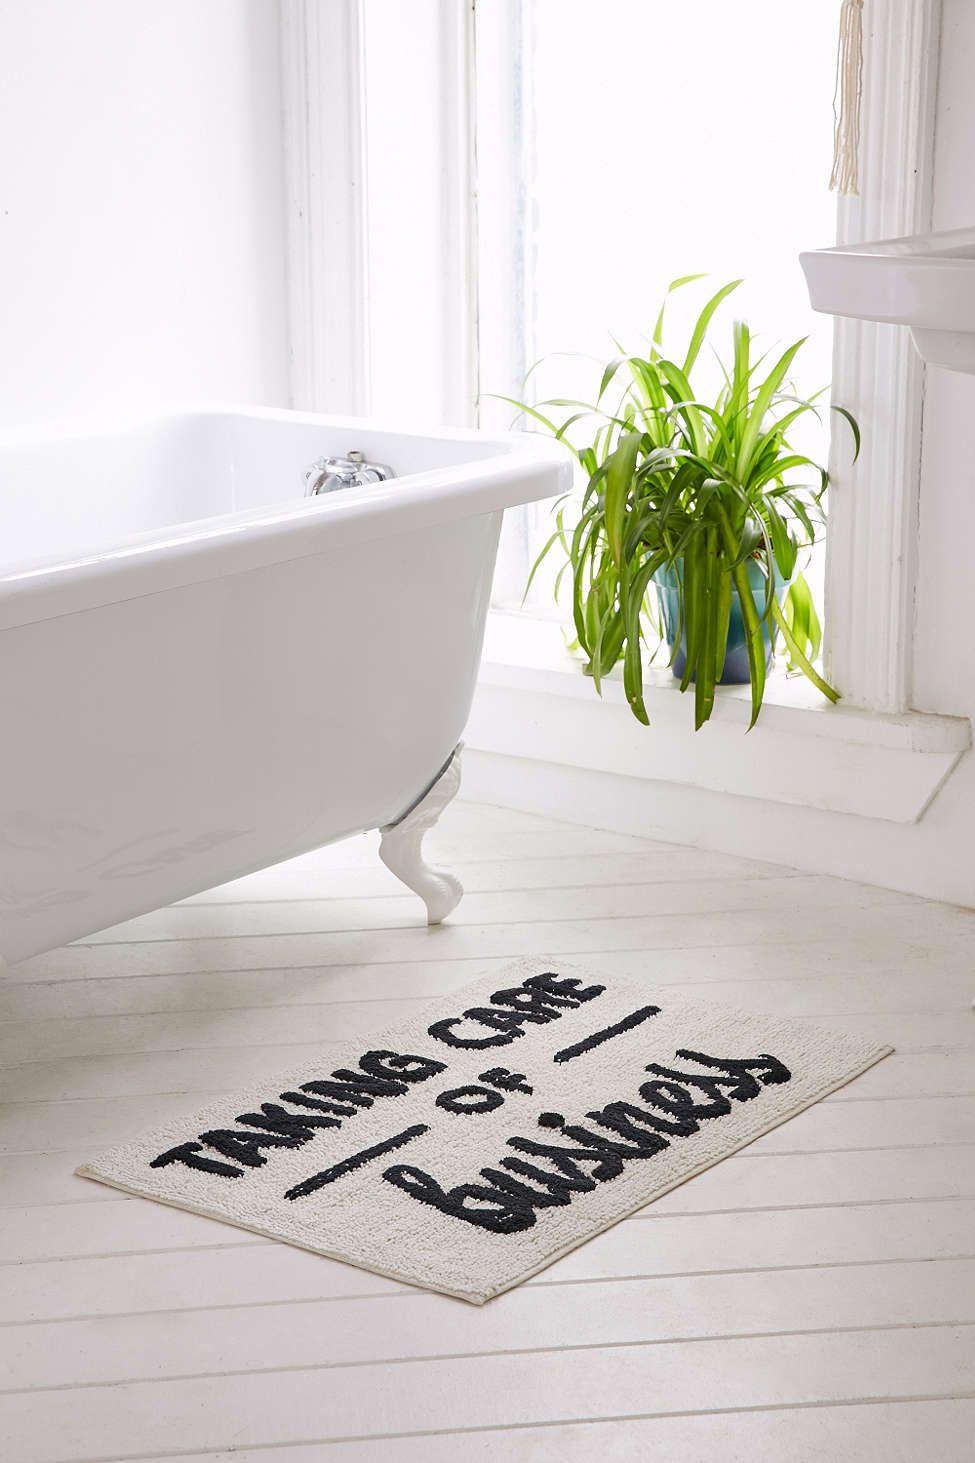 Taking Care Of Business Bath Mat $19.99 | HOME. | Pinterest | Bath ...